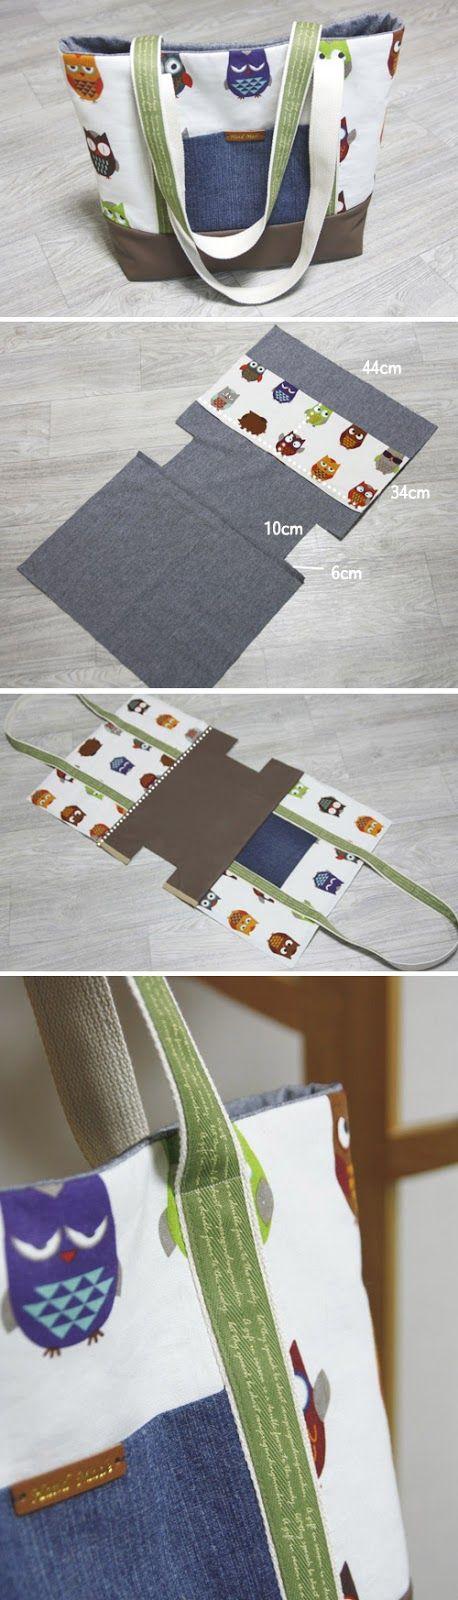 Easy Canvas Tote Bag with Pocket. Step by step DIY Tutorial. www.handmadiya.co...